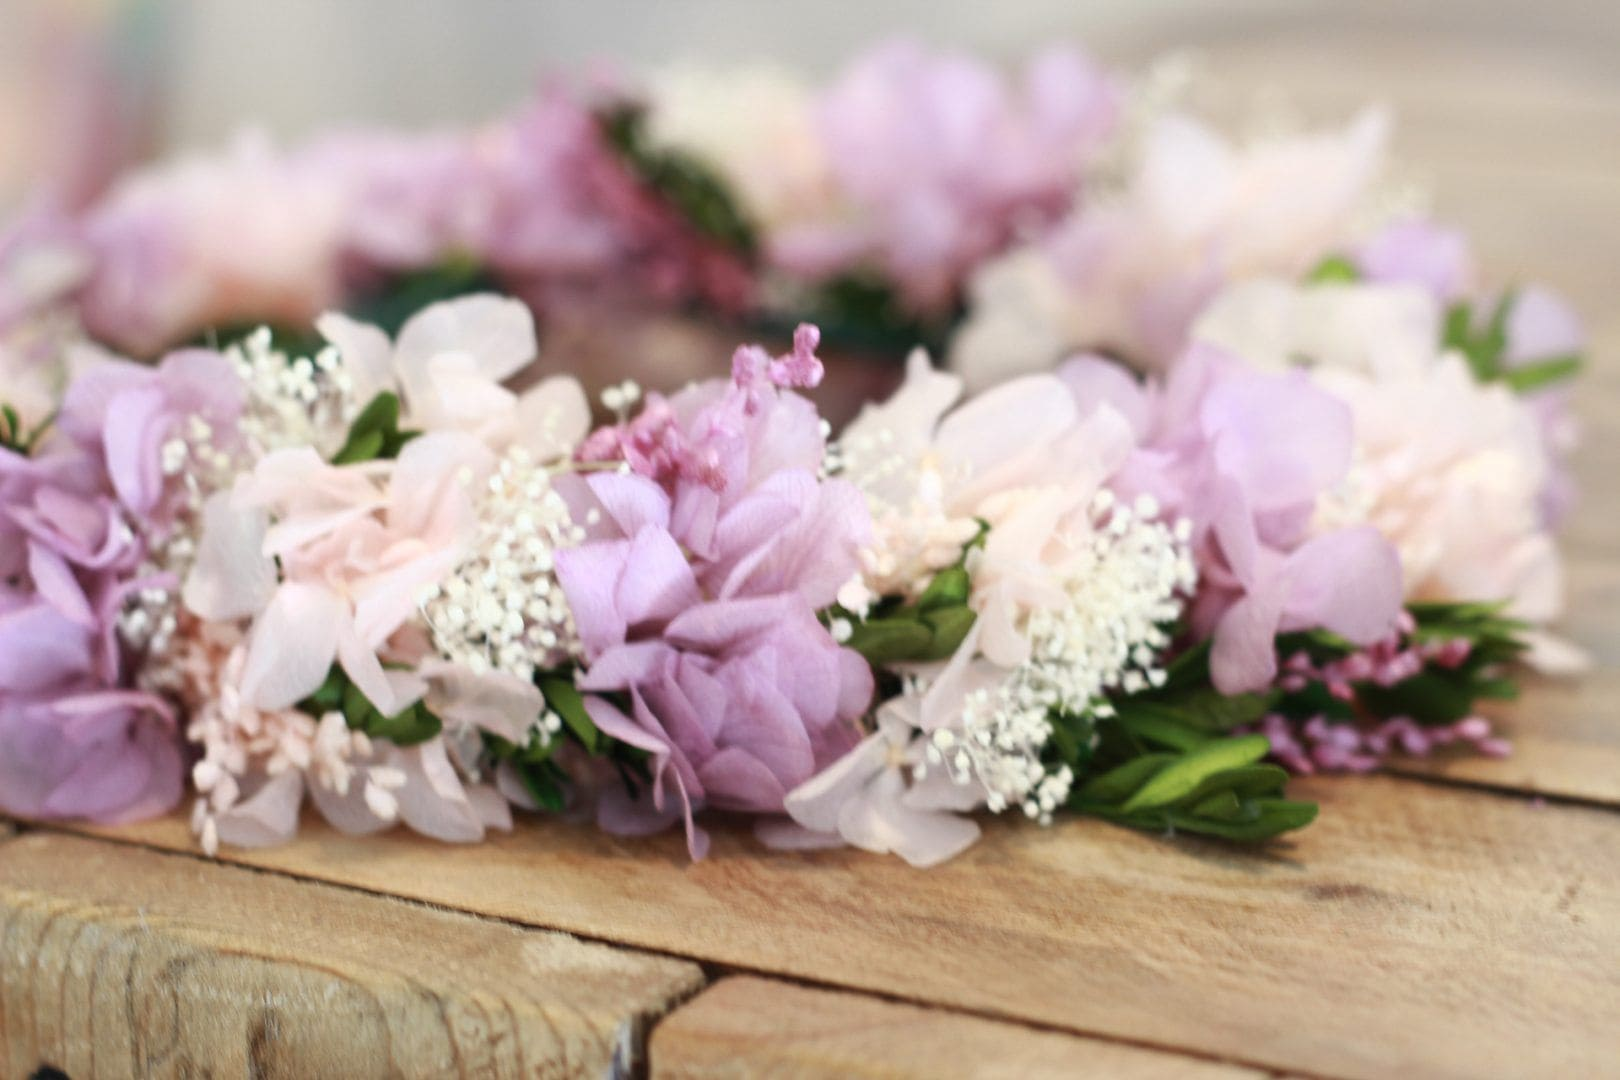 exquisitae-decoracion-con-flores-talleres-florales-7385